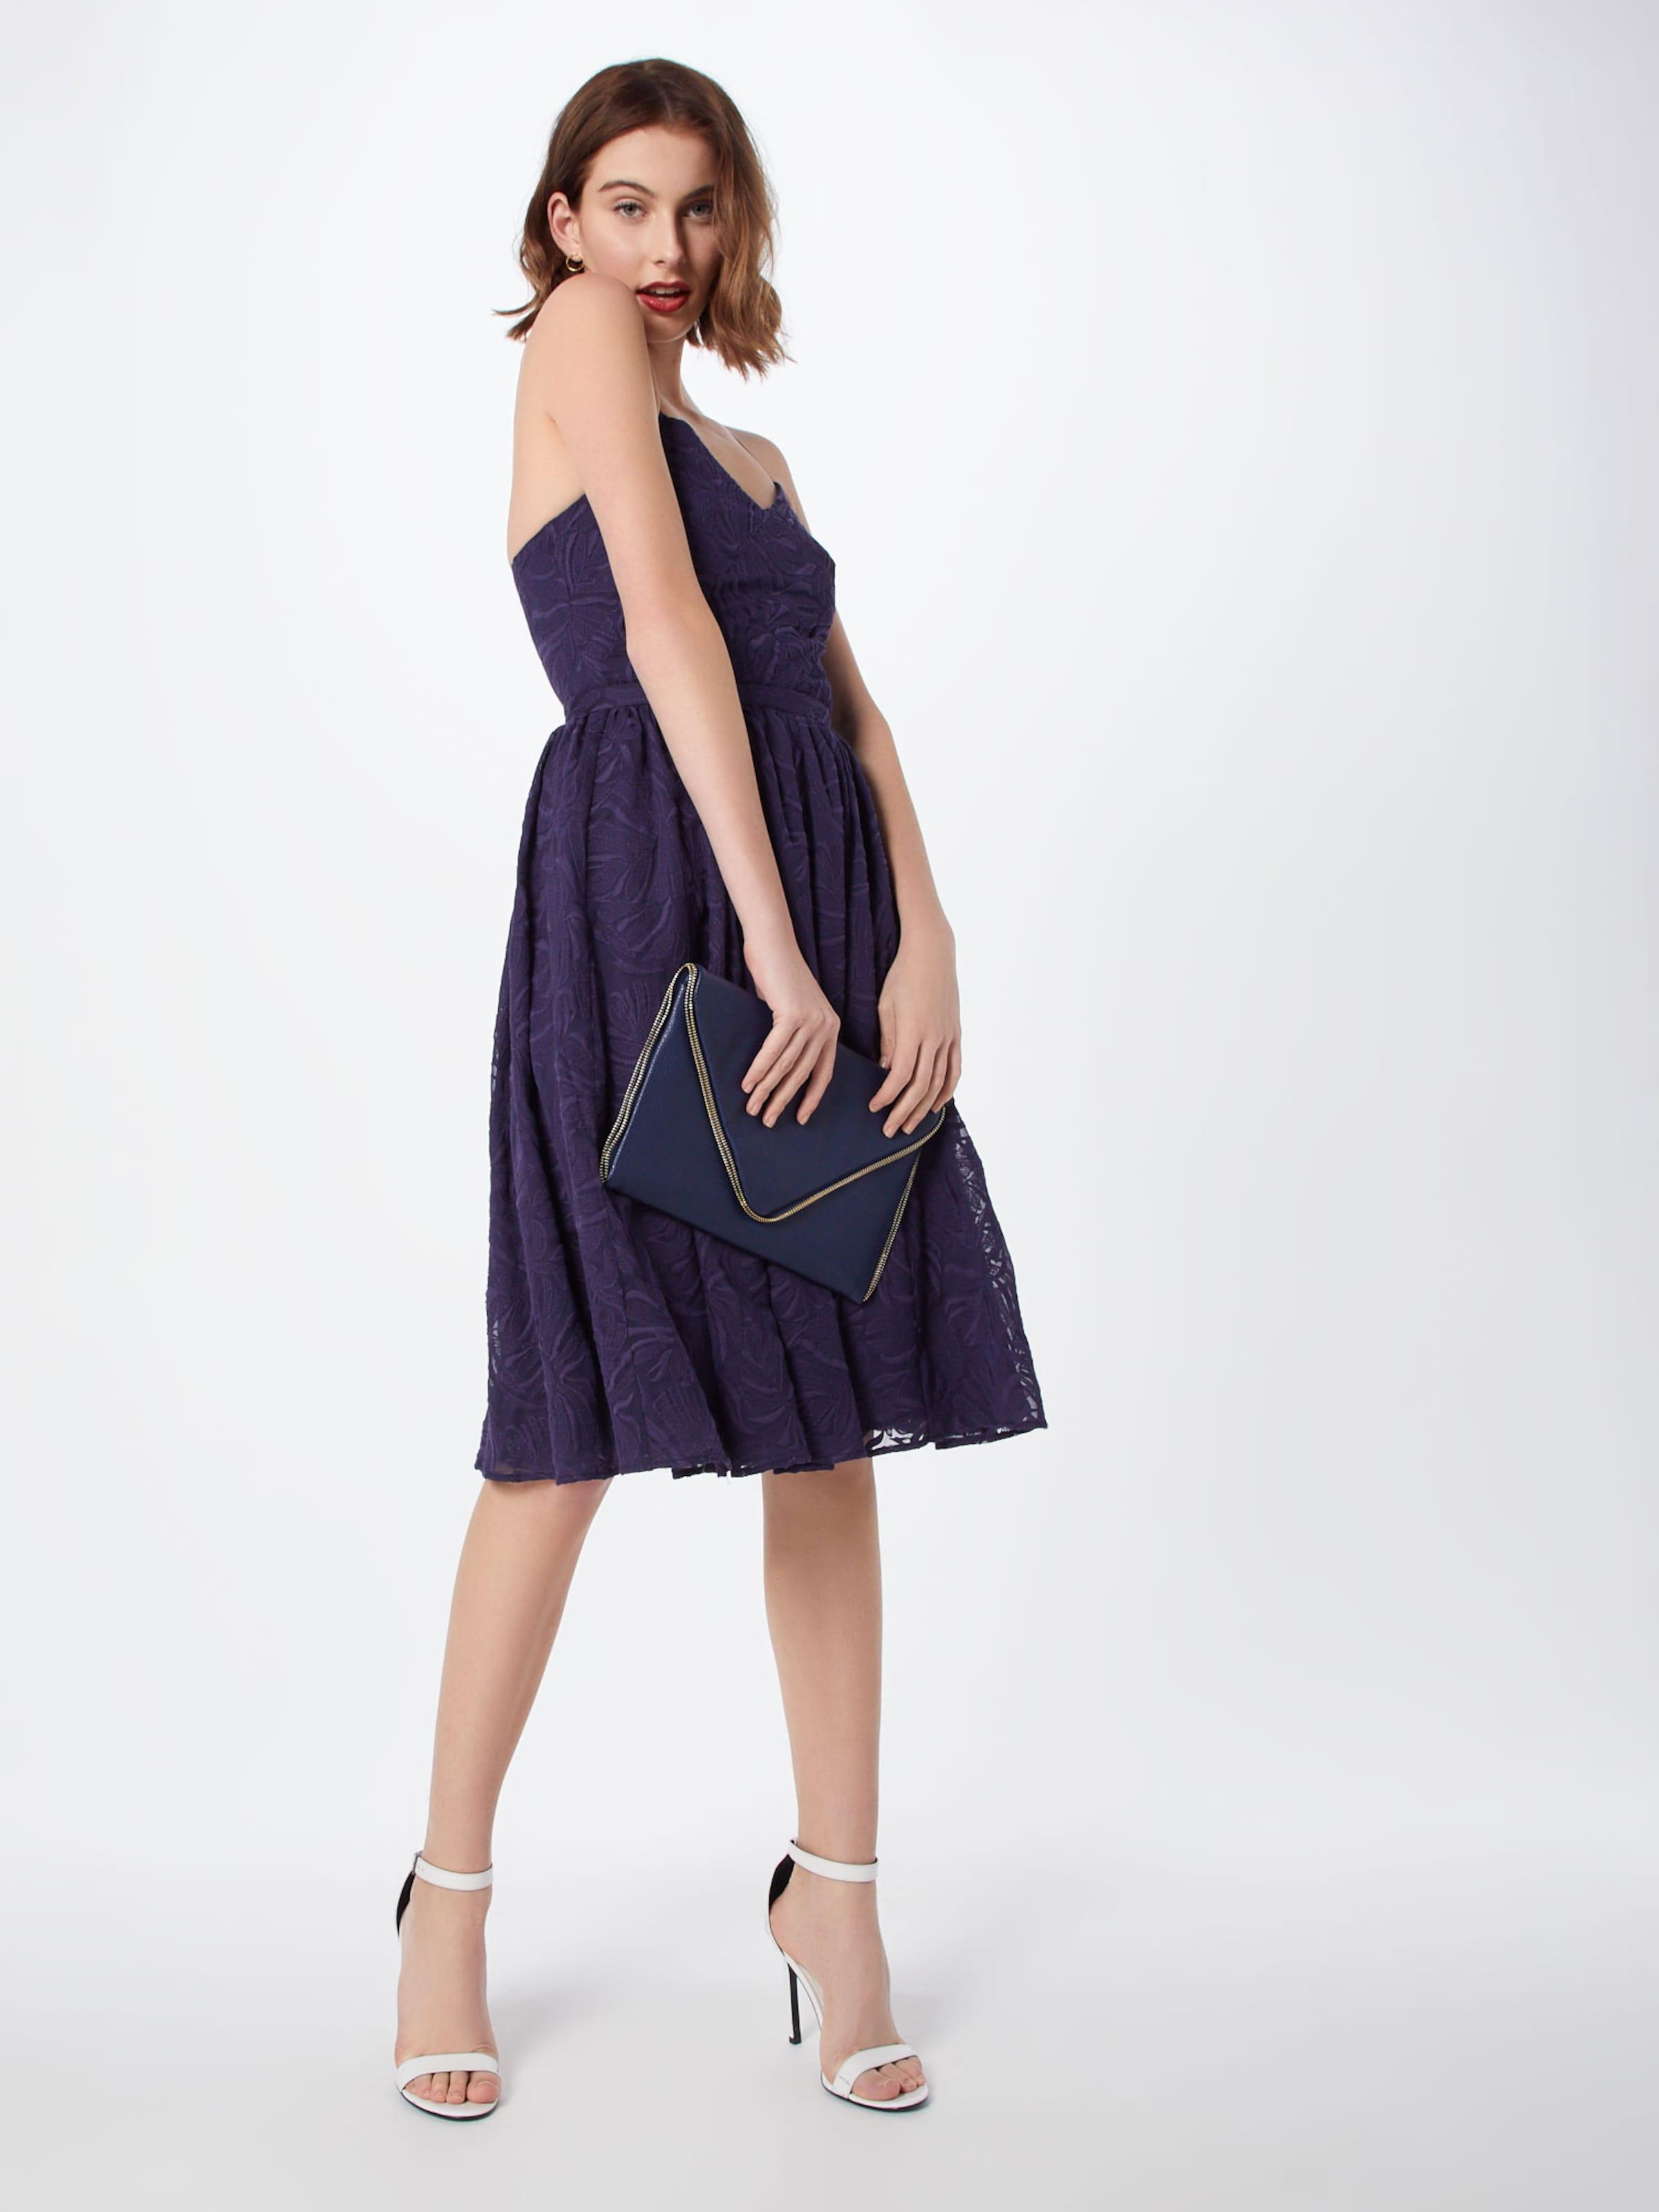 Sessun In Violettblau Sessun Kleid In Kleid TK1uFclJ3